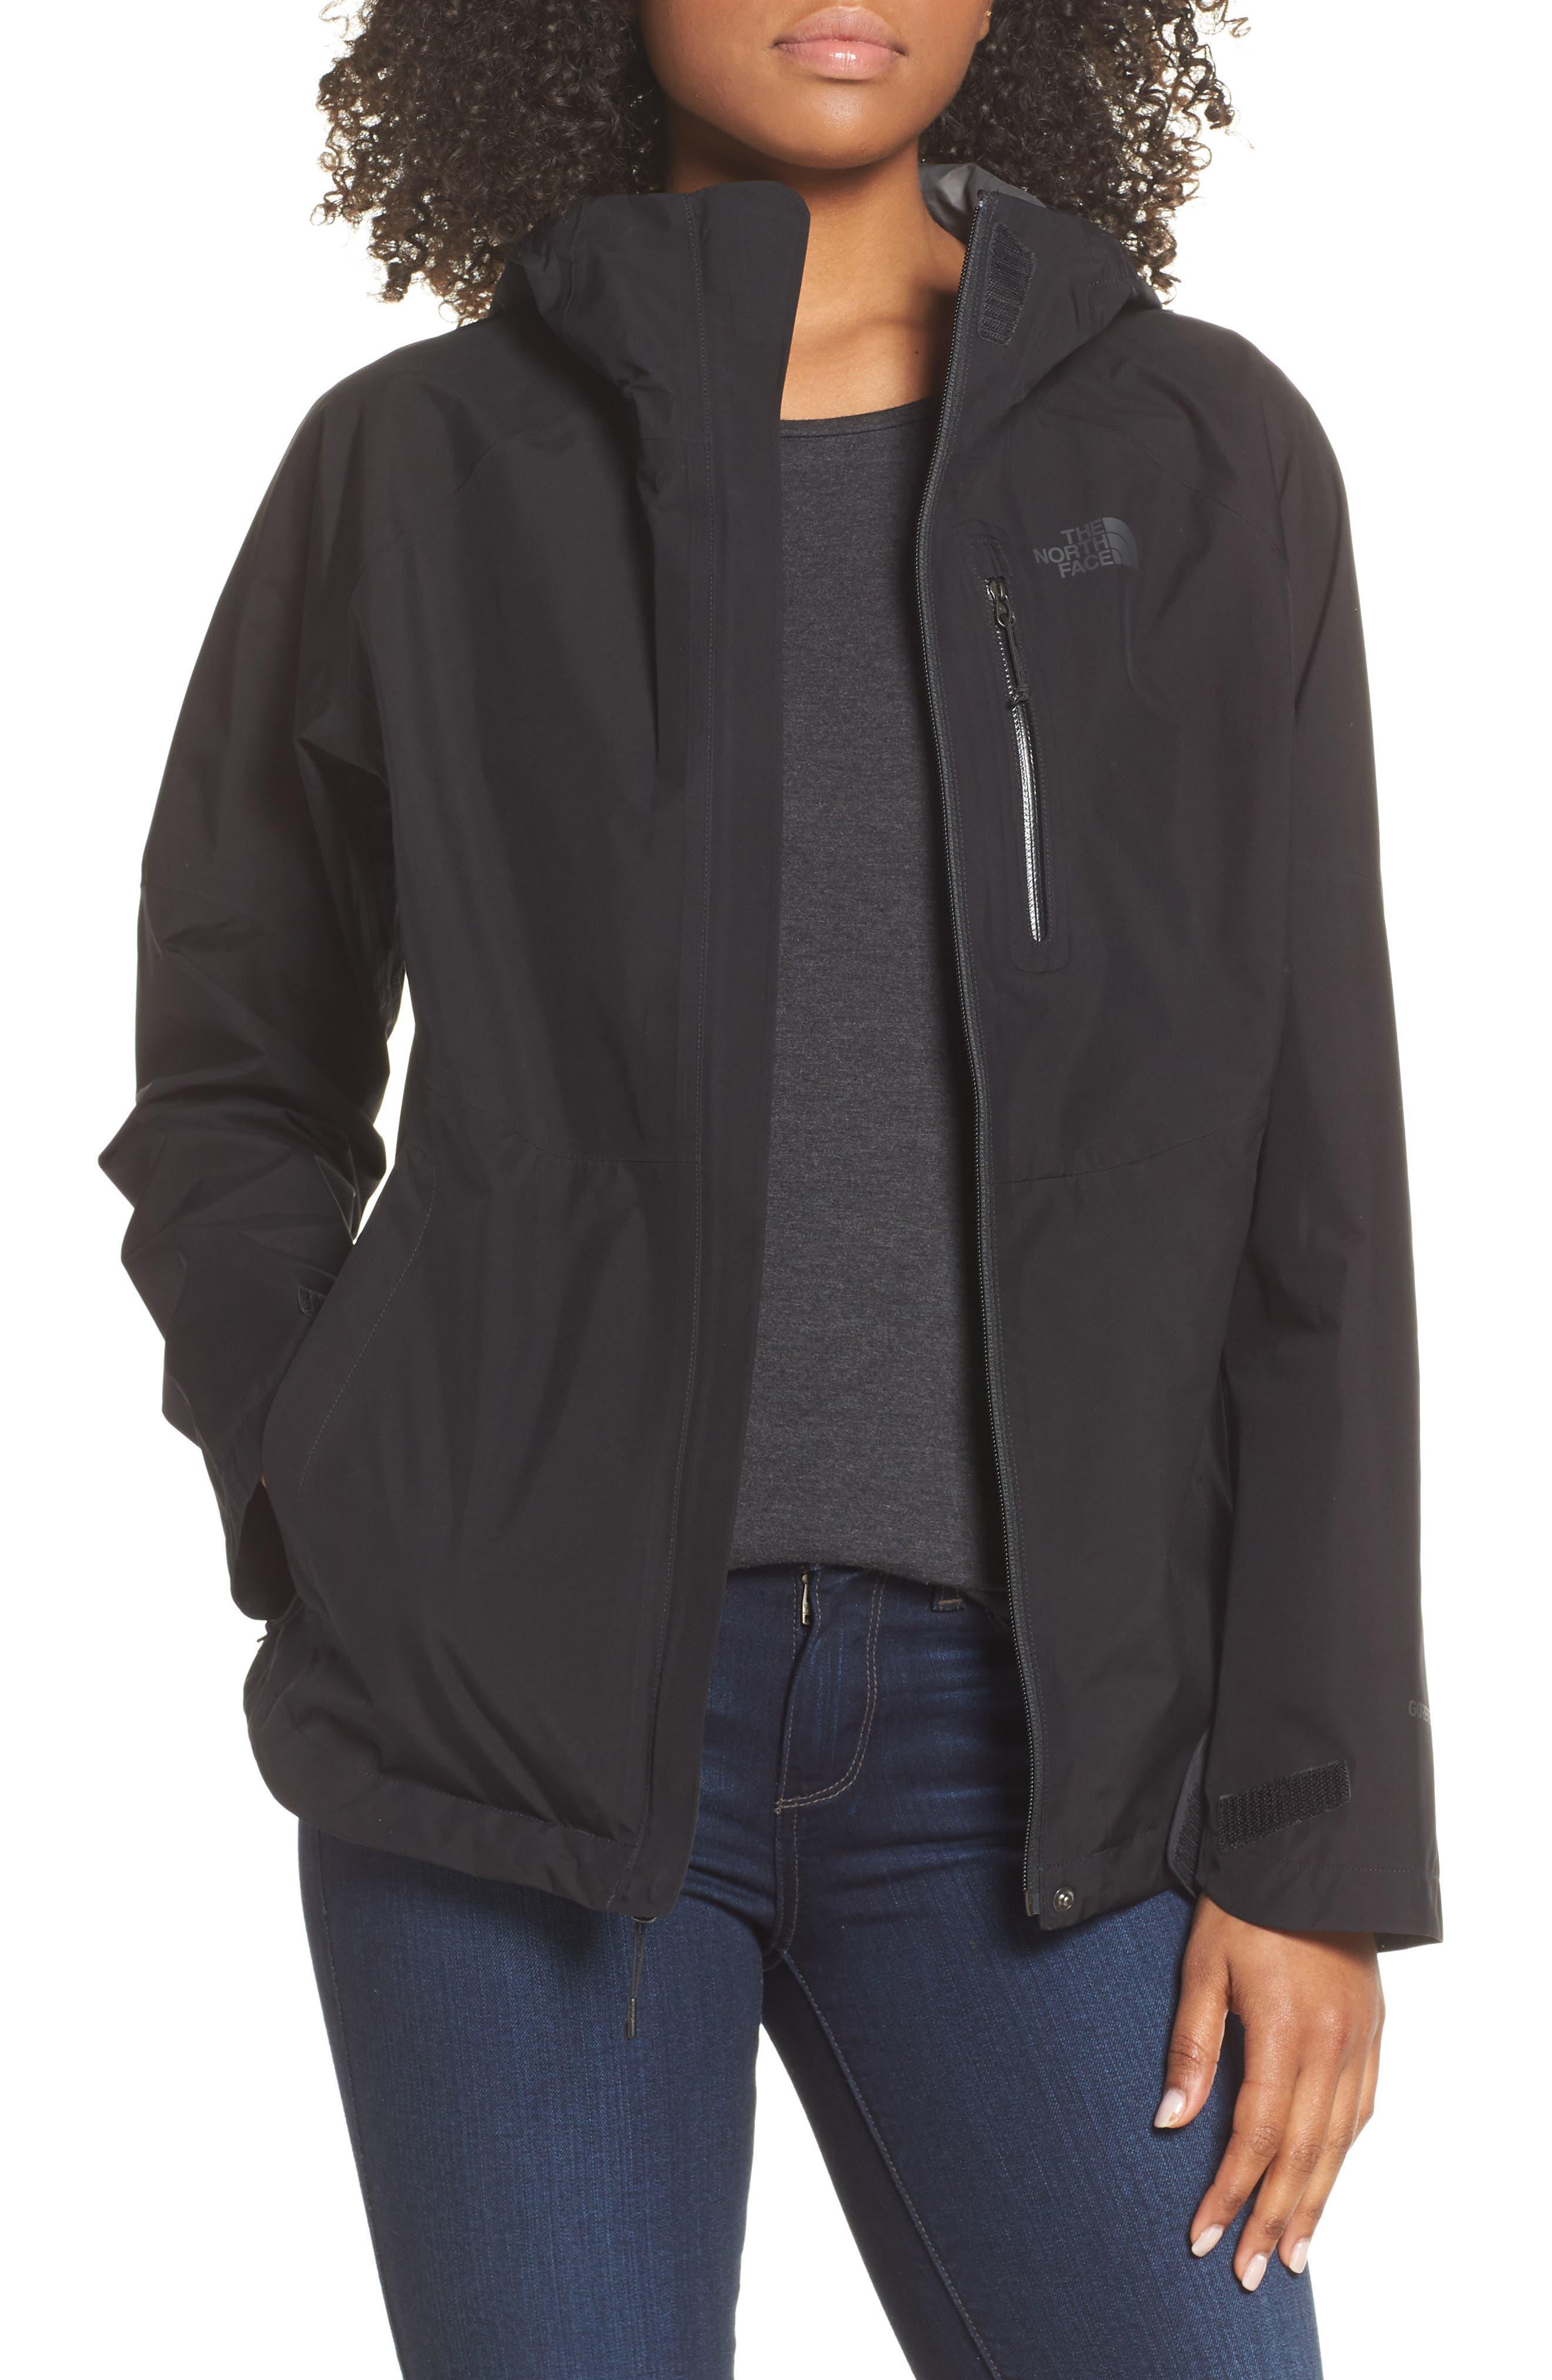 THE NORTH FACE, Dryzzle Hooded Rain Jacket, Main thumbnail 1, color, TNF BLACK